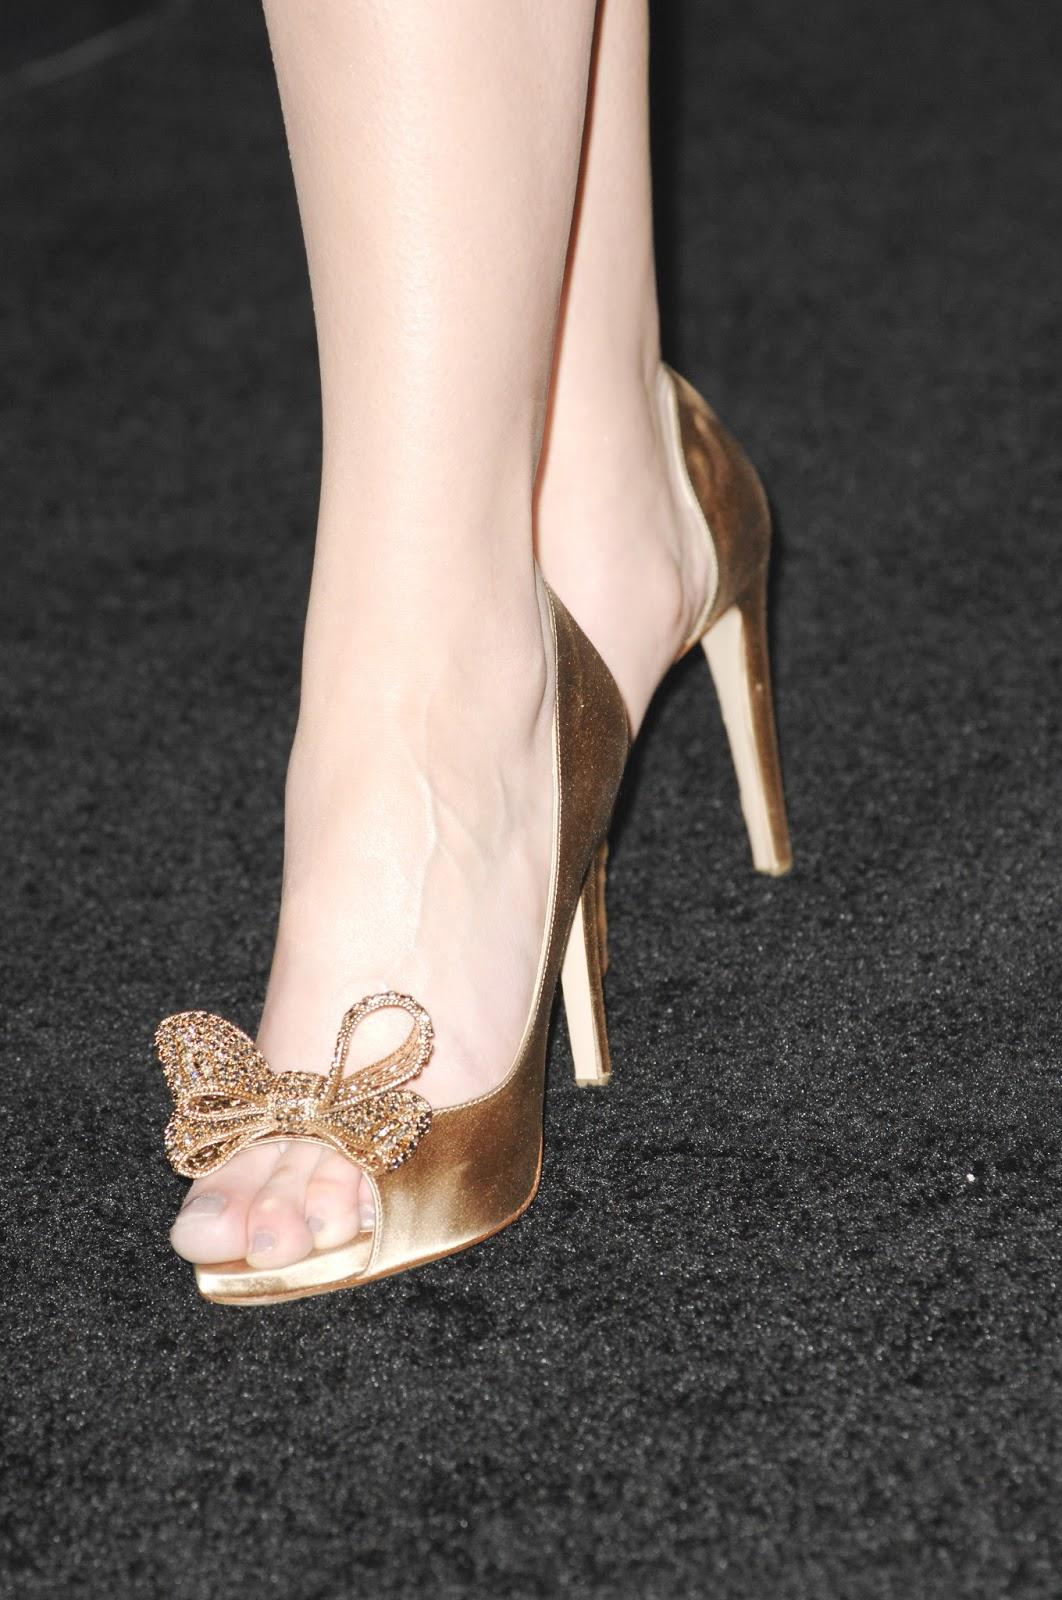 Katherine Heigl | Celebrity Shoes Gallery